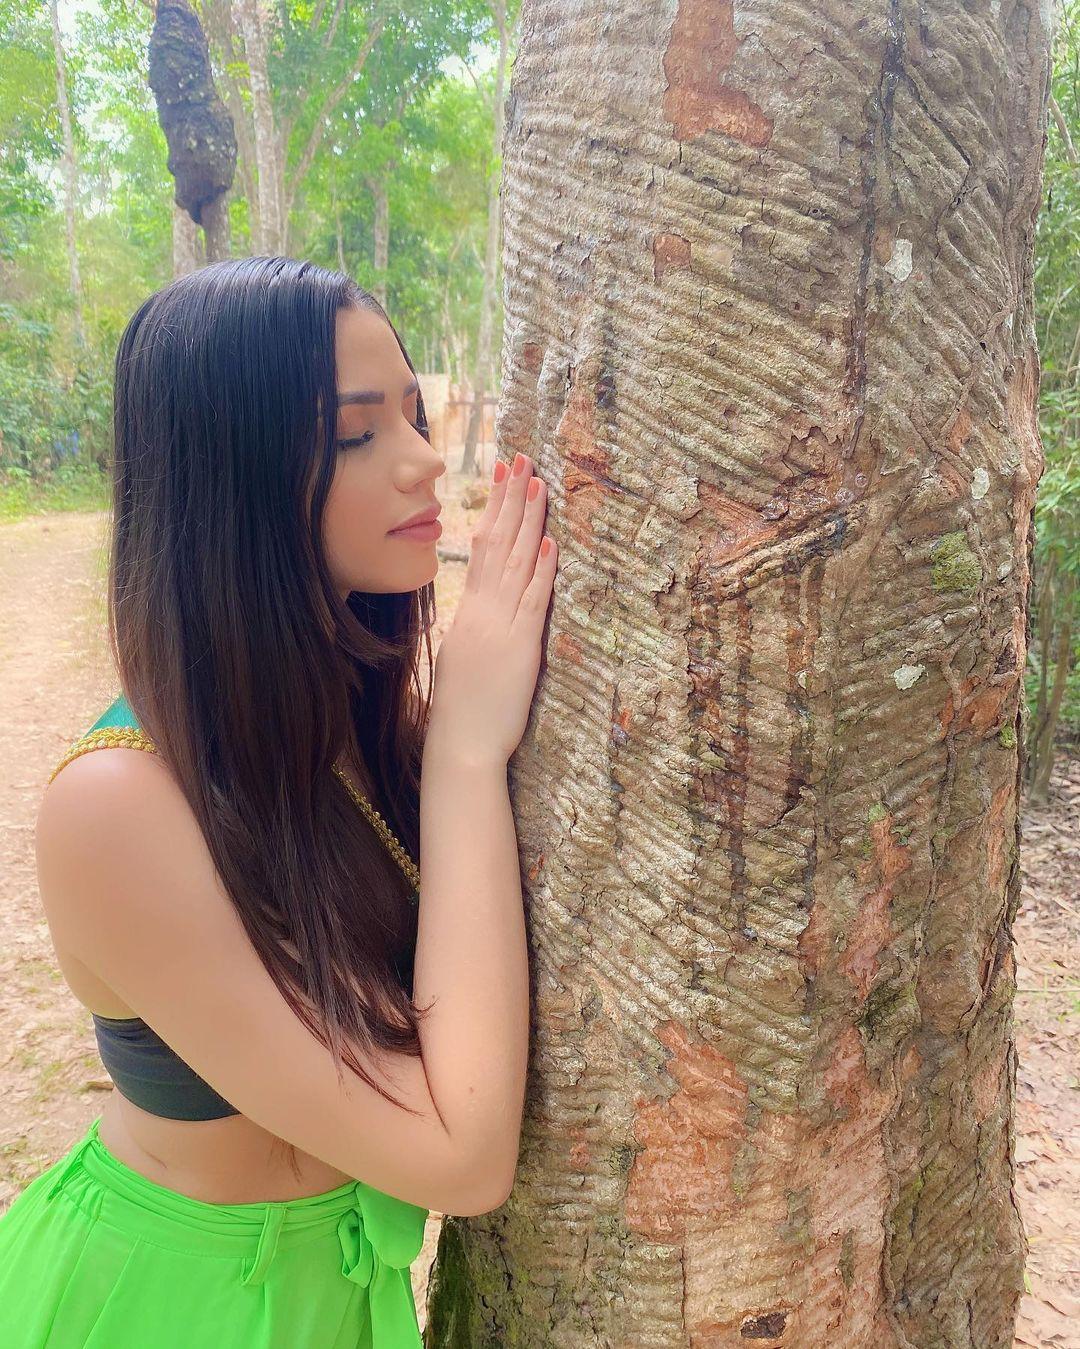 thais bergamini, miss terra brasil 2020. Thaisb14